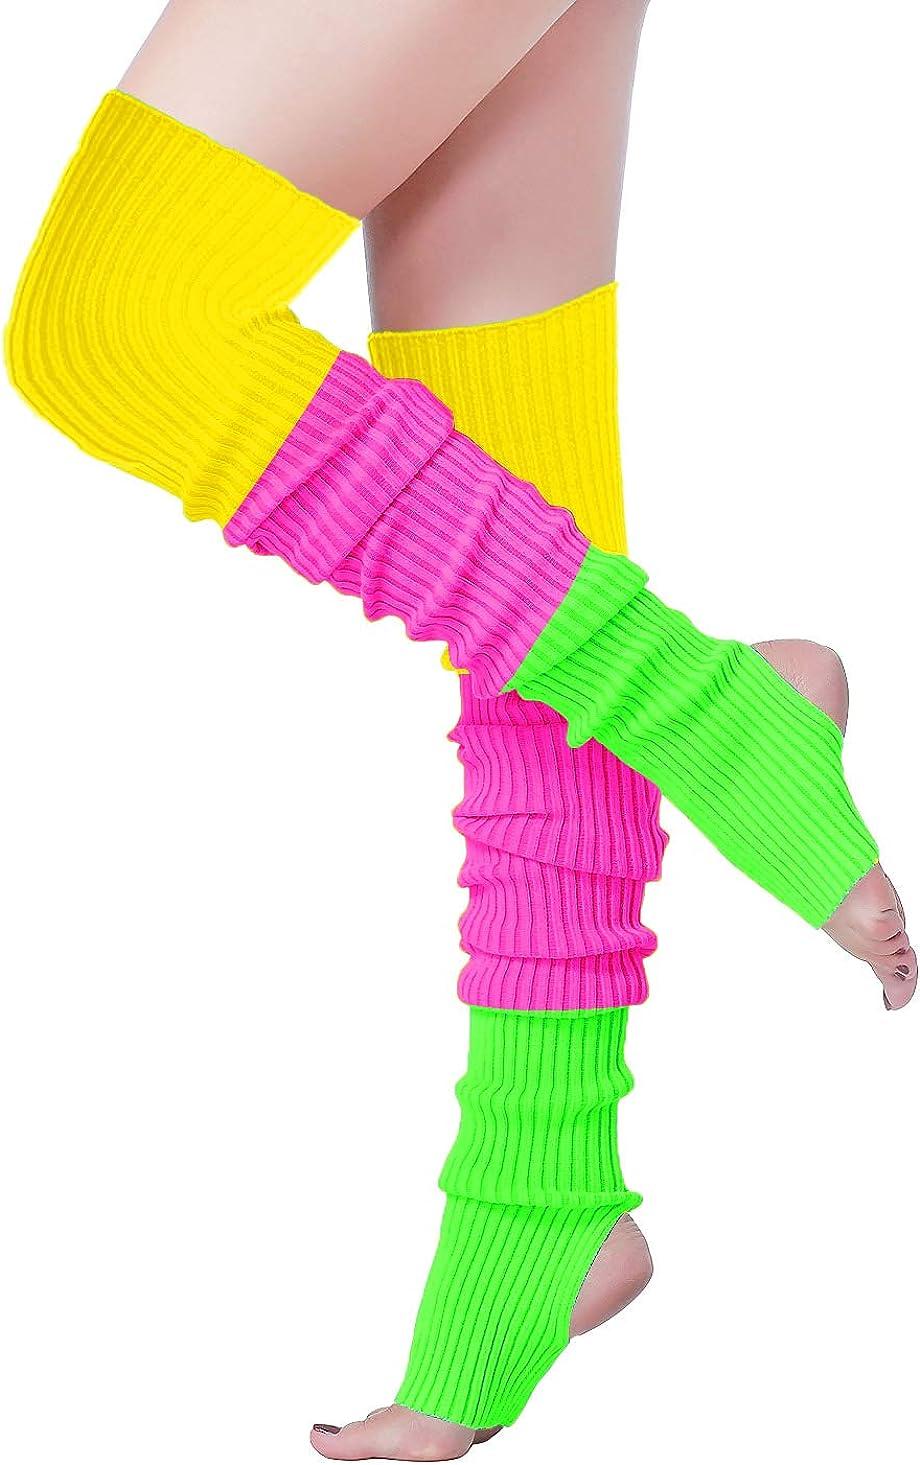 Vintage Style Socks- Knee High, Bobby, Anklet V28 Women 80s Party Warm Costume Marathon Knit Long Socks Leg Warmers $14.99 AT vintagedancer.com